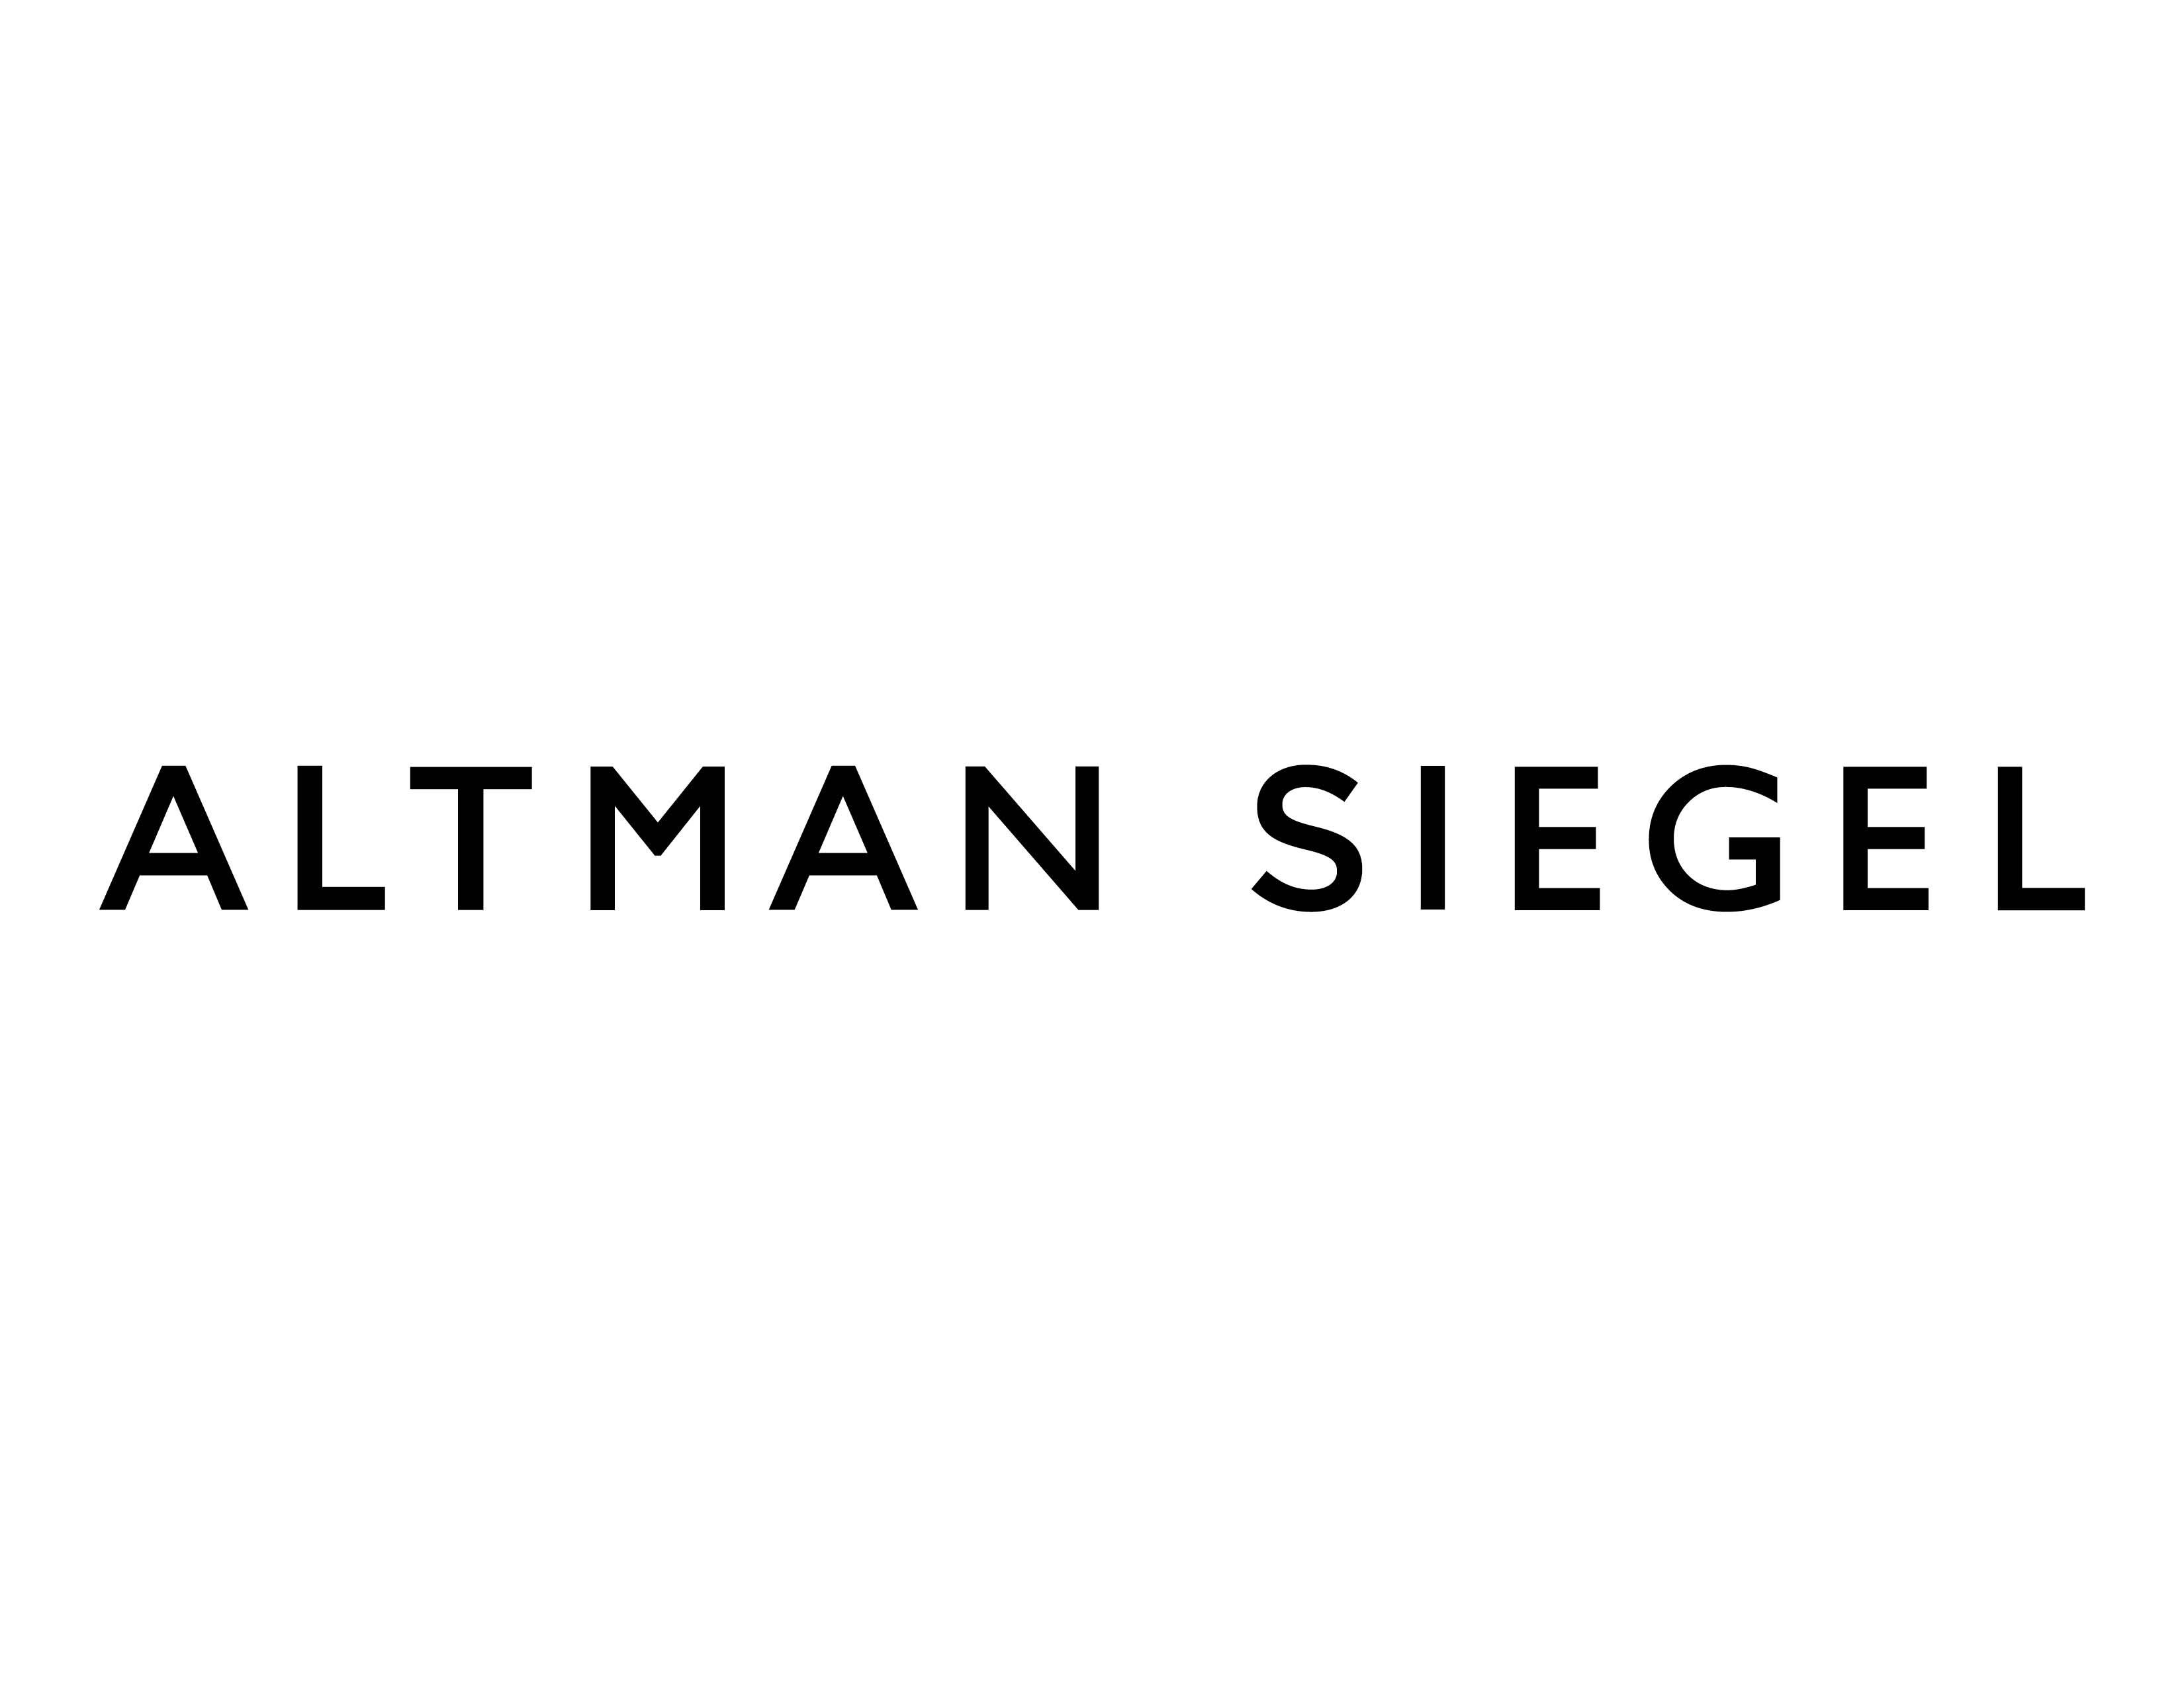 Altman Siegel company logo